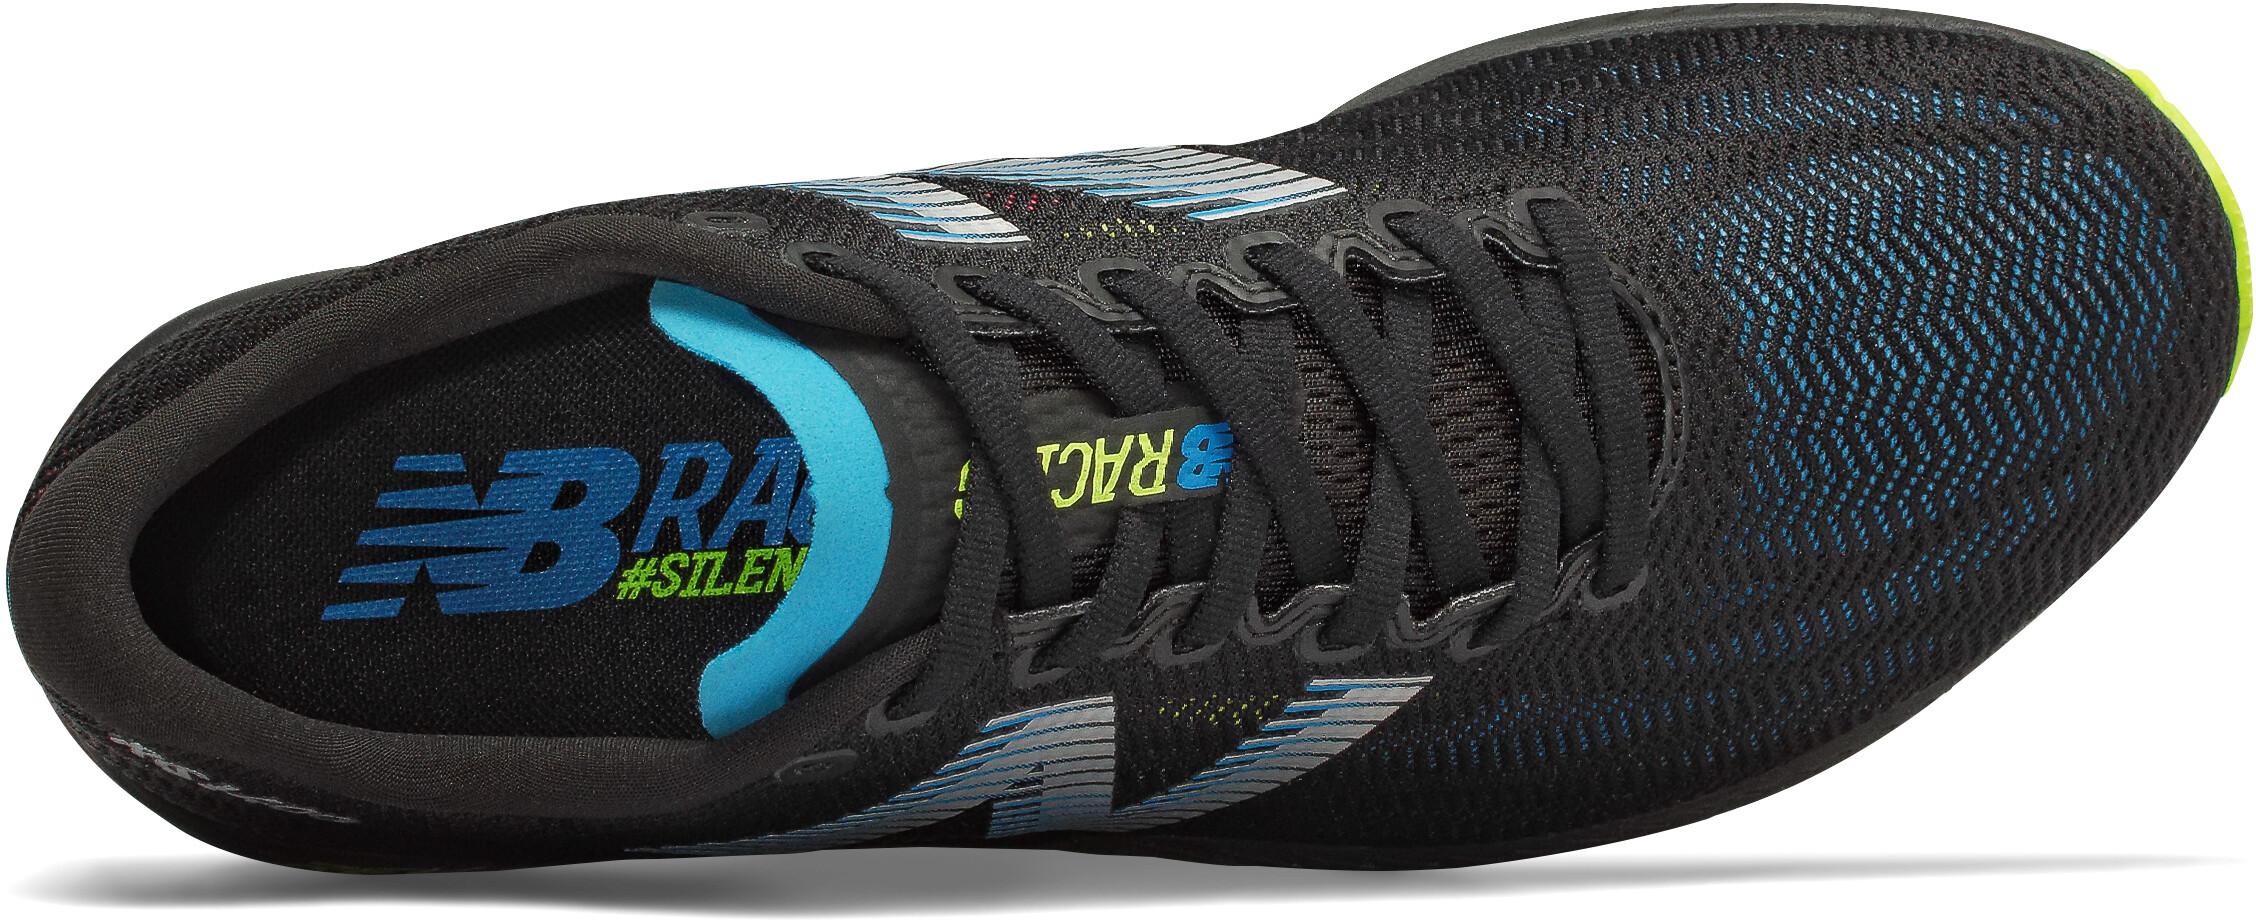 buy online 1da8a 722b5 New Balance 1400 V6 Shoes Men black/blue